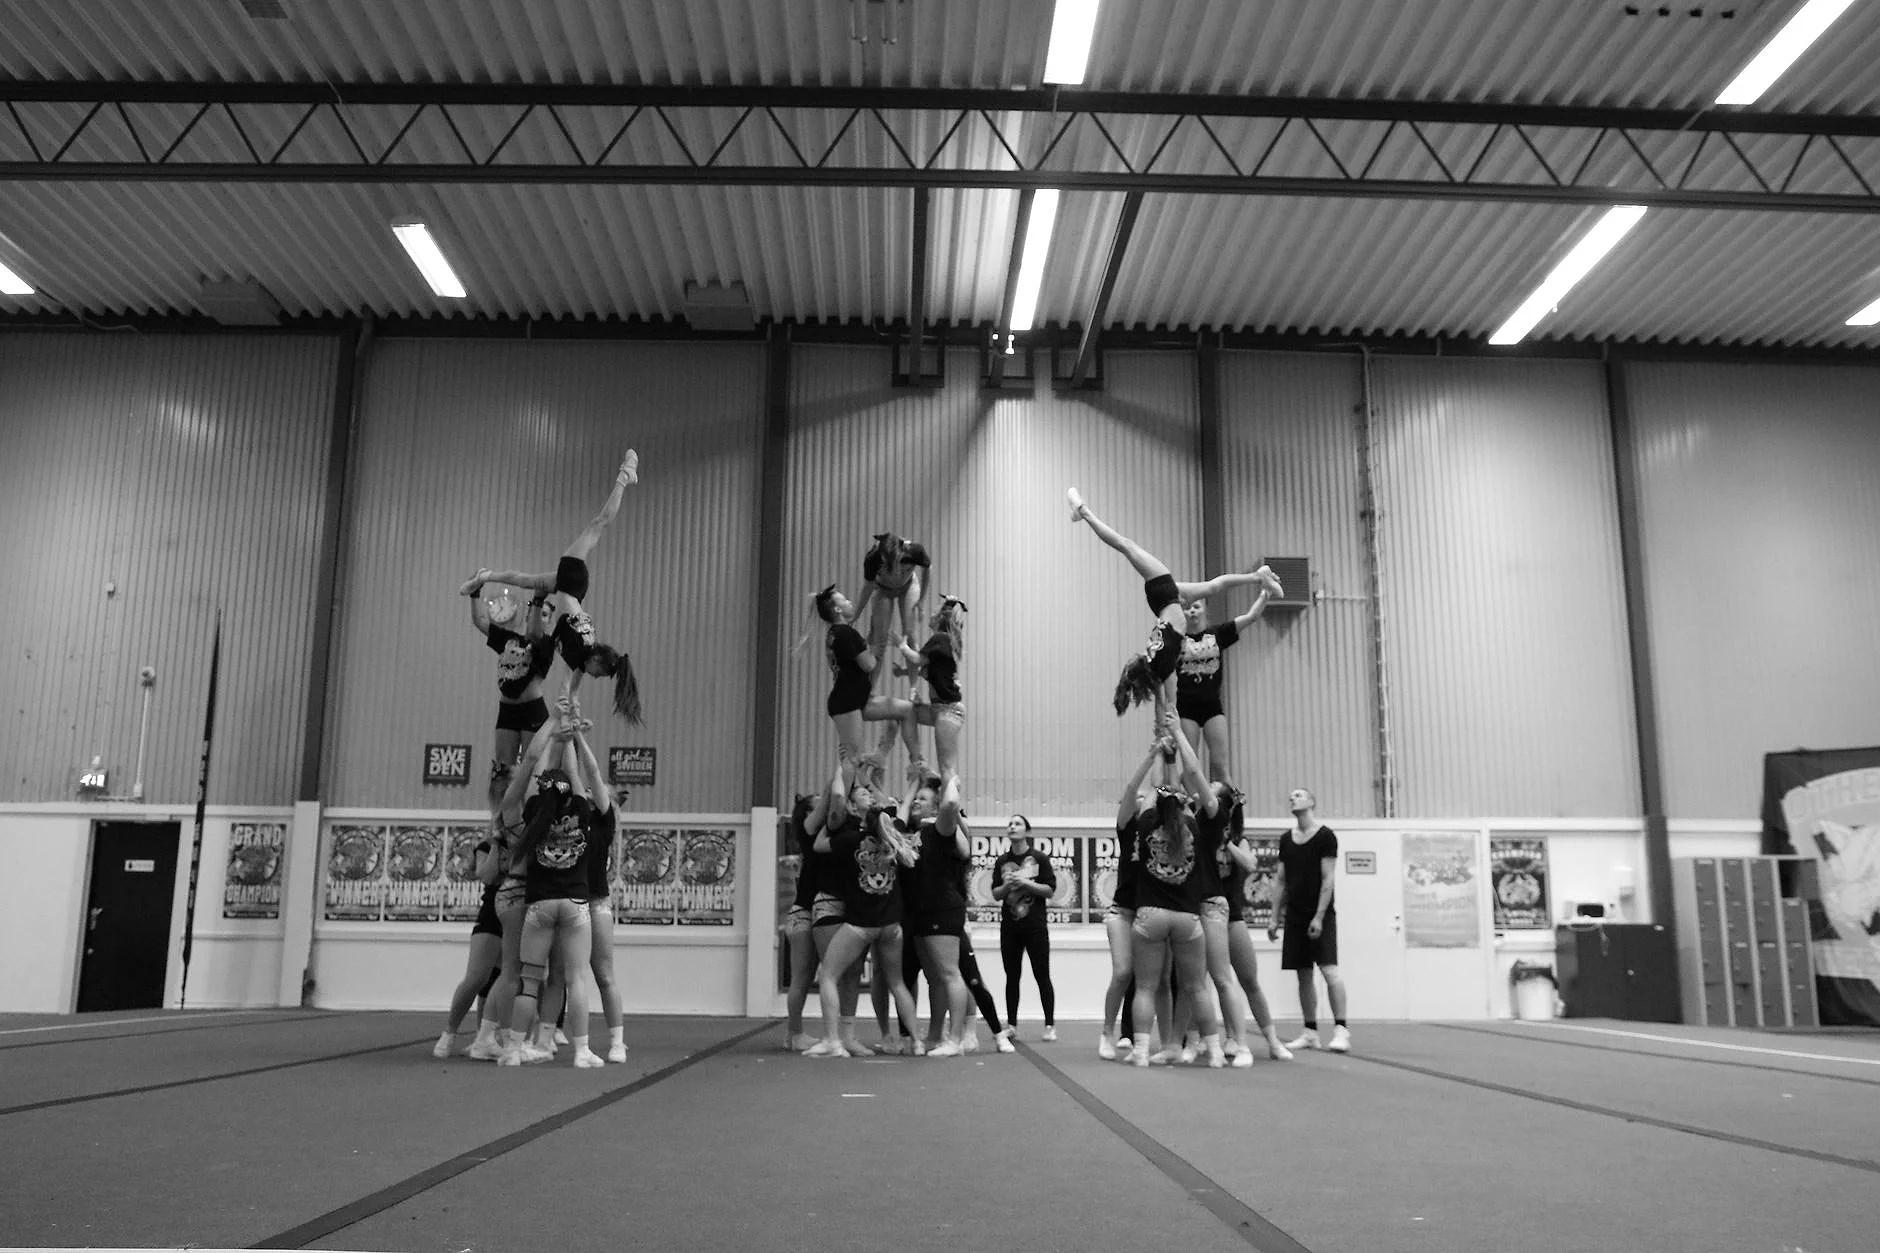 competition week - cheerleading